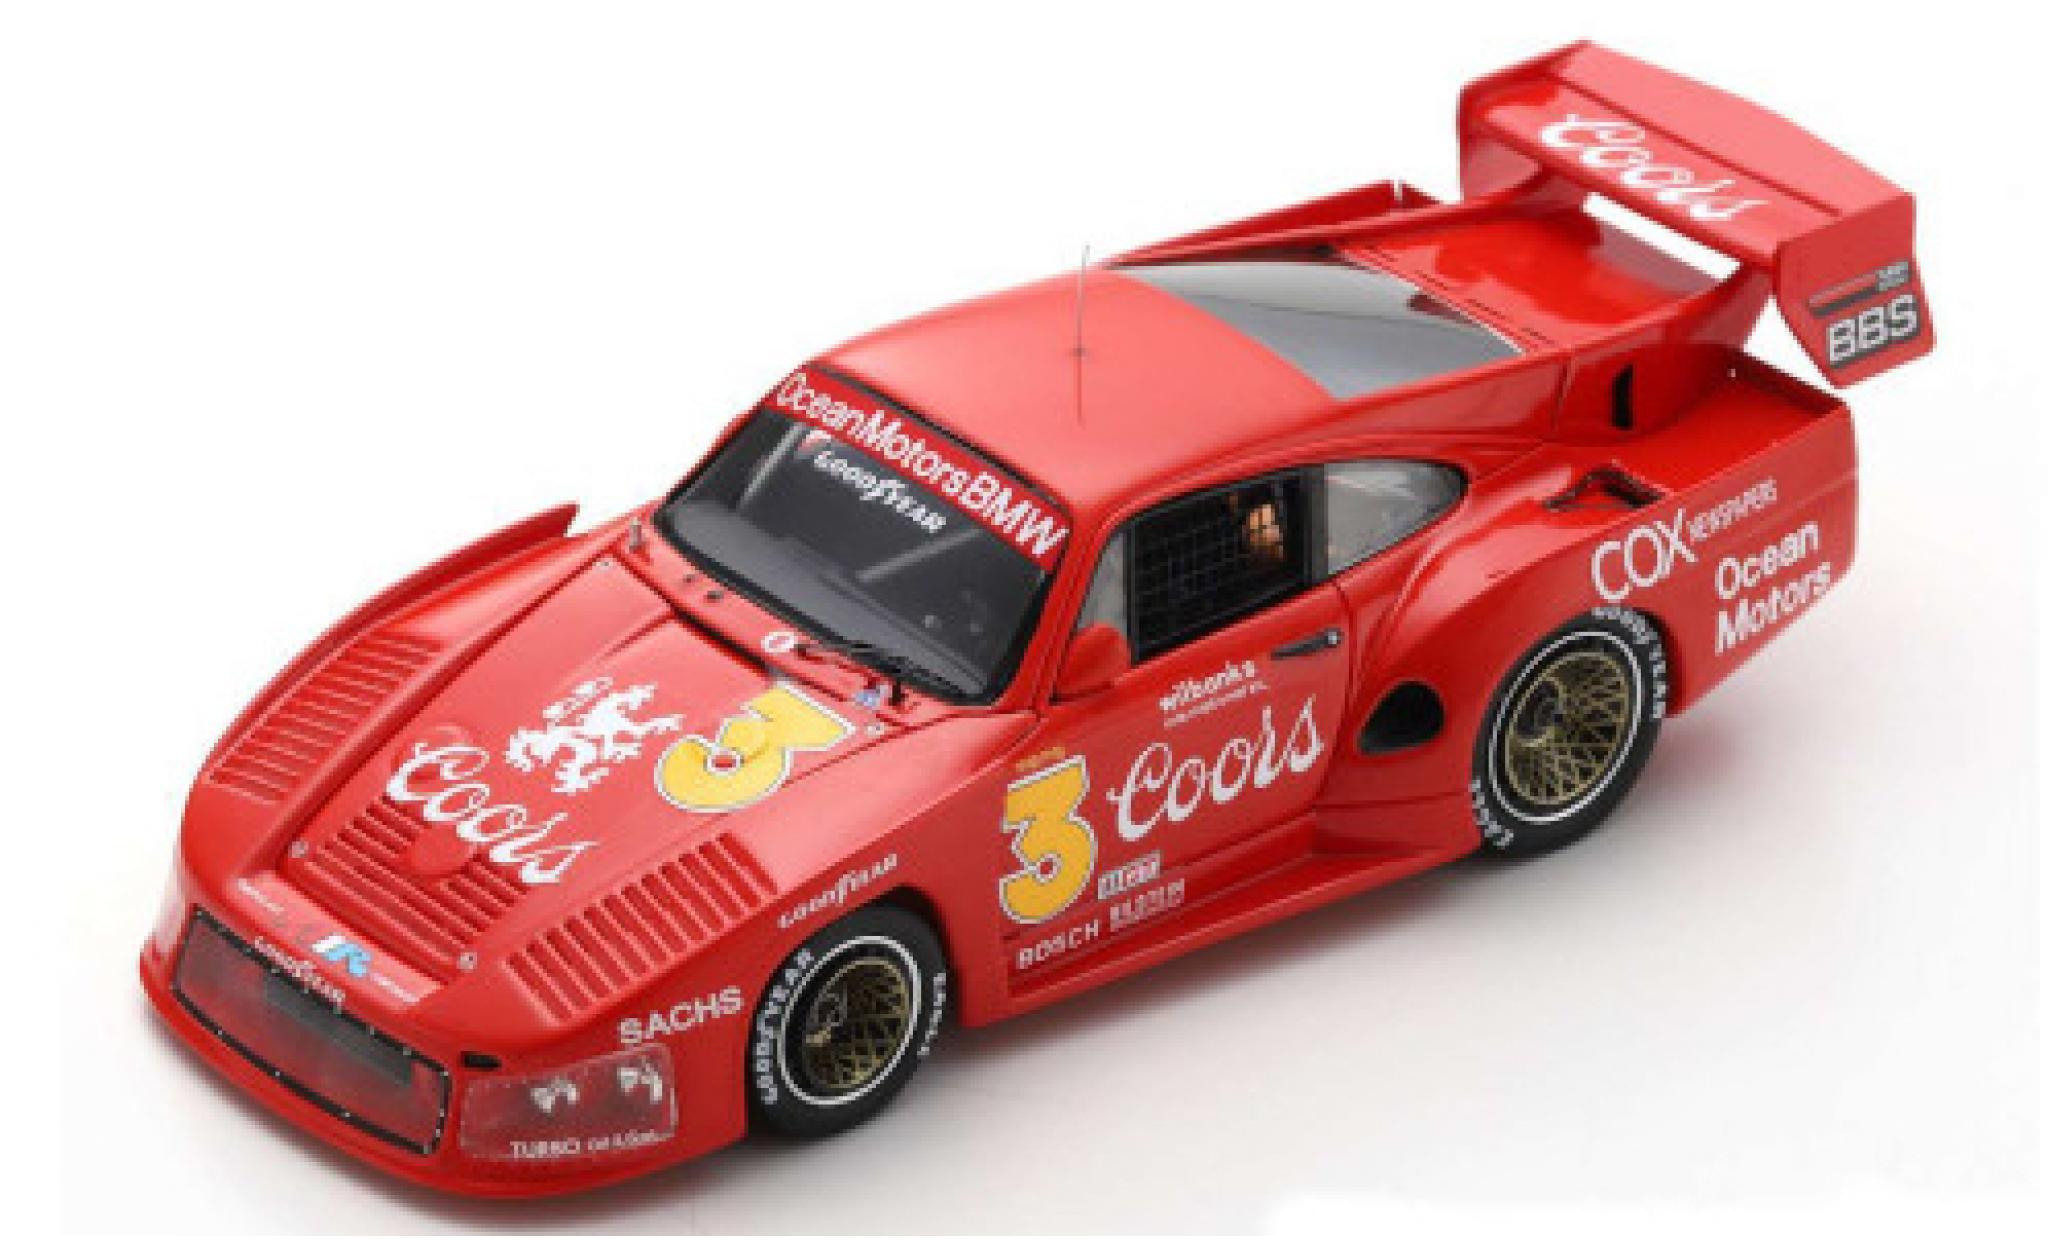 Porsche 935 1980 1/43 Spark M16 No.3 Ocean Motors Coors Portland J.Busby